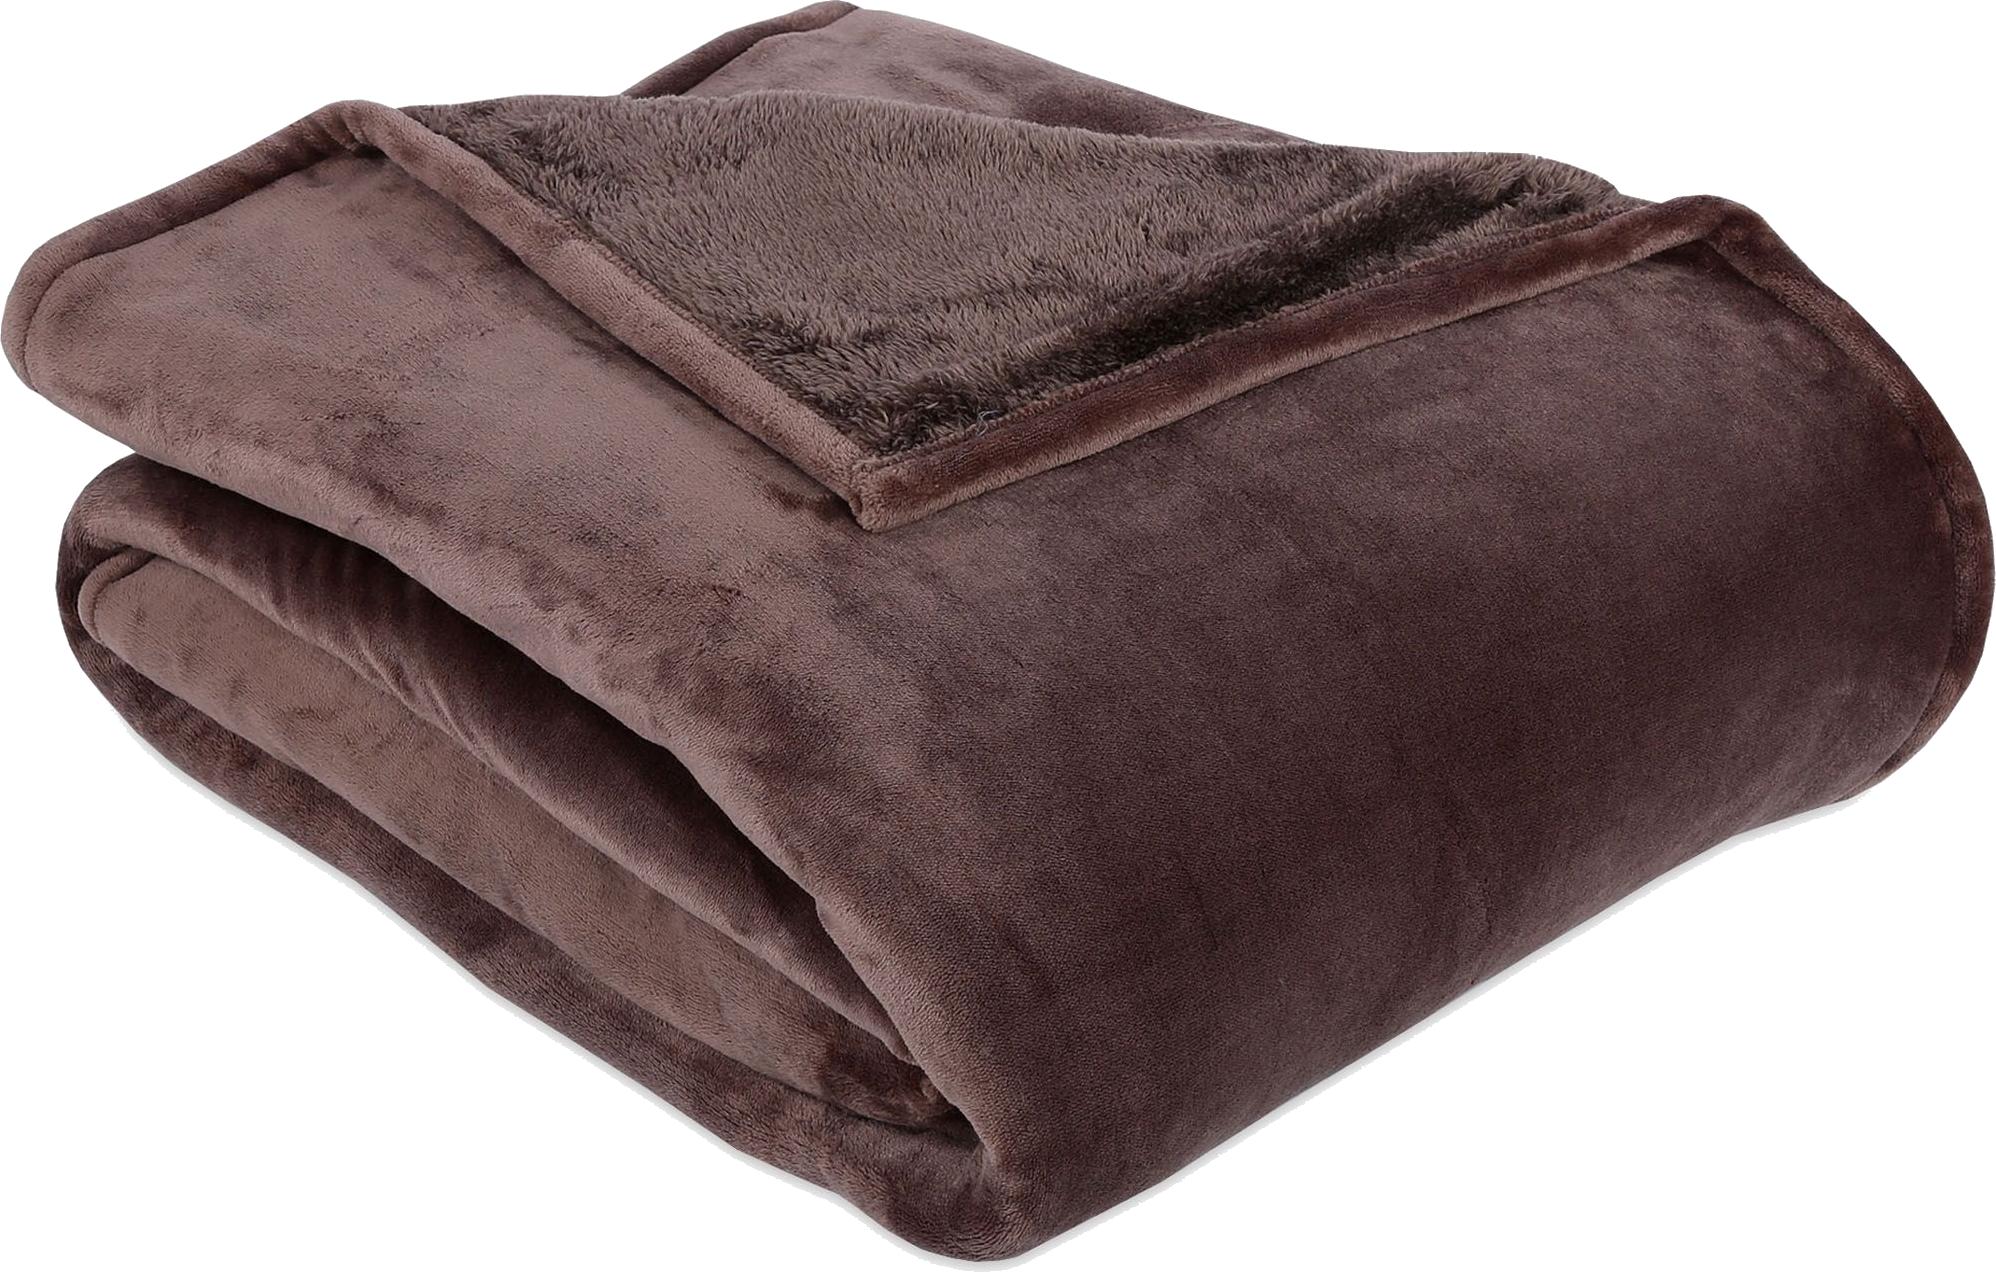 Blanket PNG images free download.